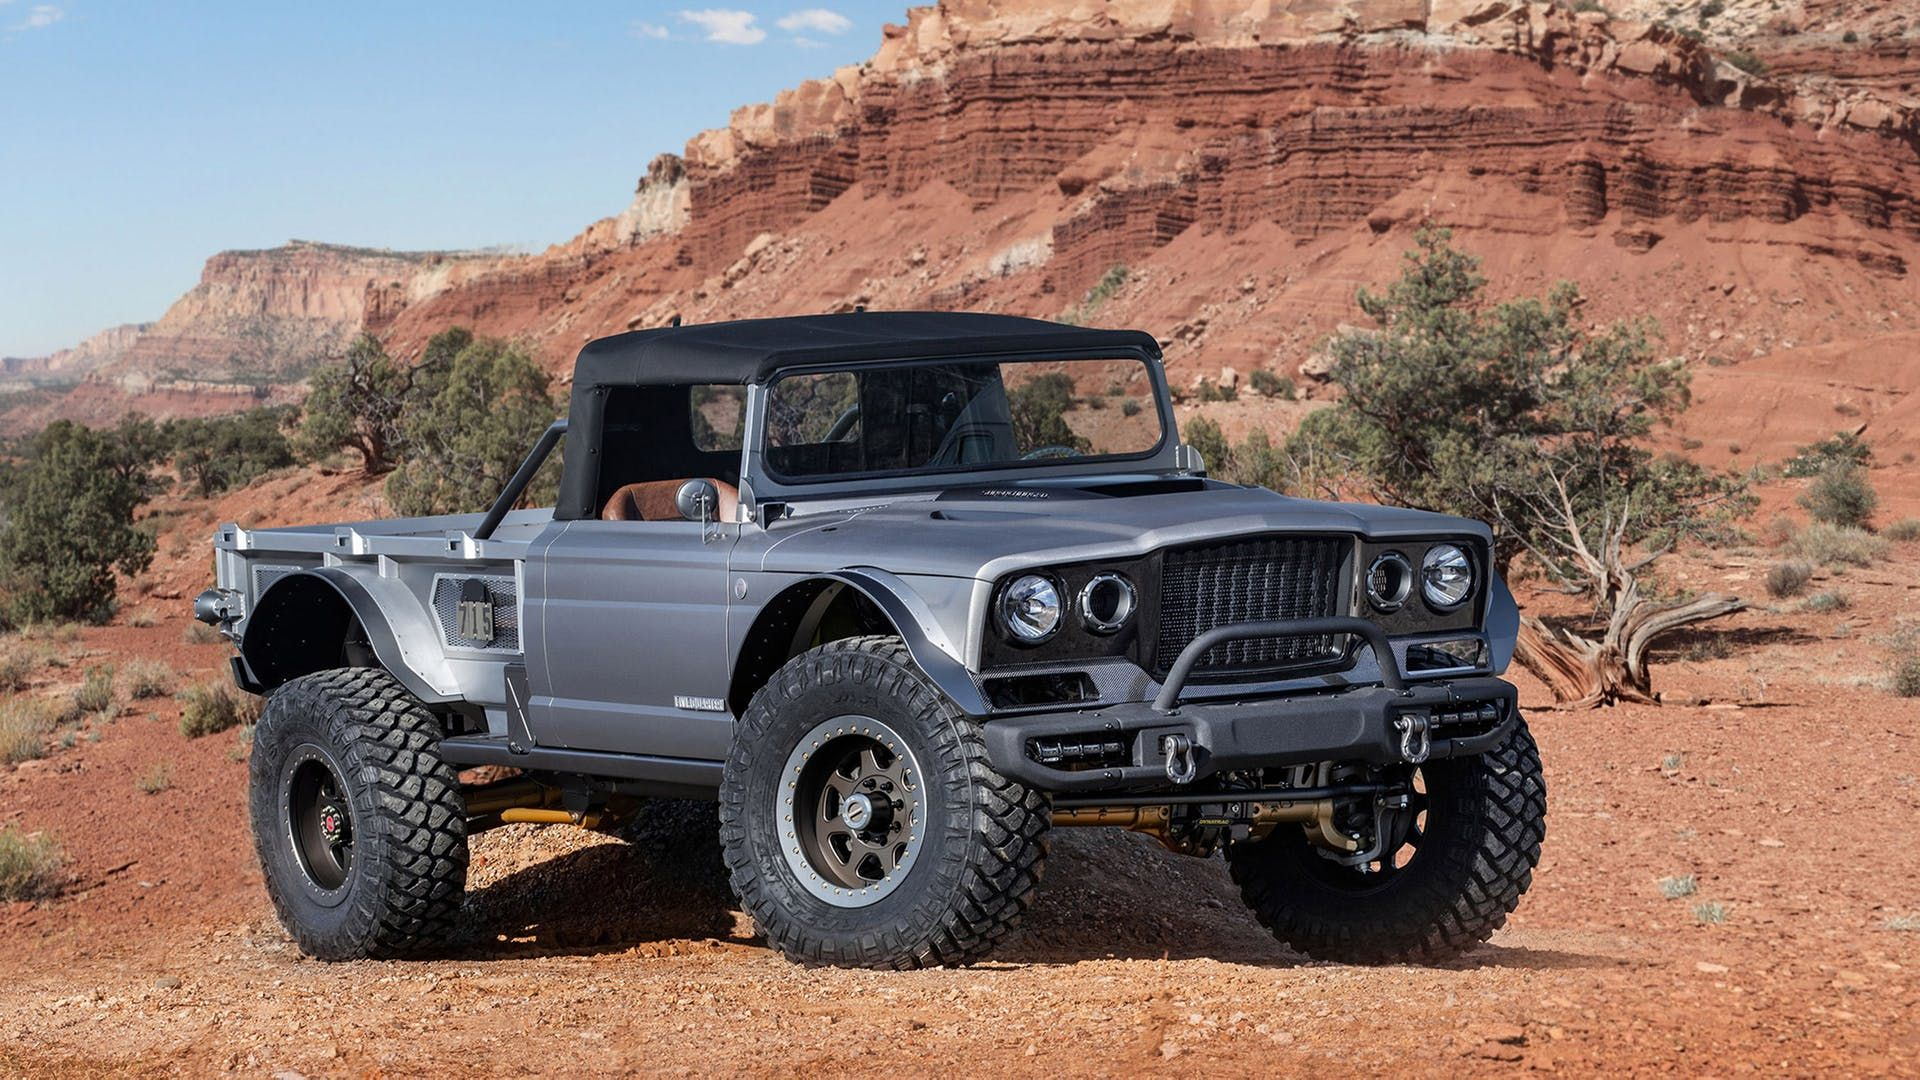 2020 Jeep Gladiator Pickup Truck Dominates 2019 Easter Jeep Safari Concepts The Drive In 2020 Jeep Concept Jeep Gladiator Easter Jeep Safari